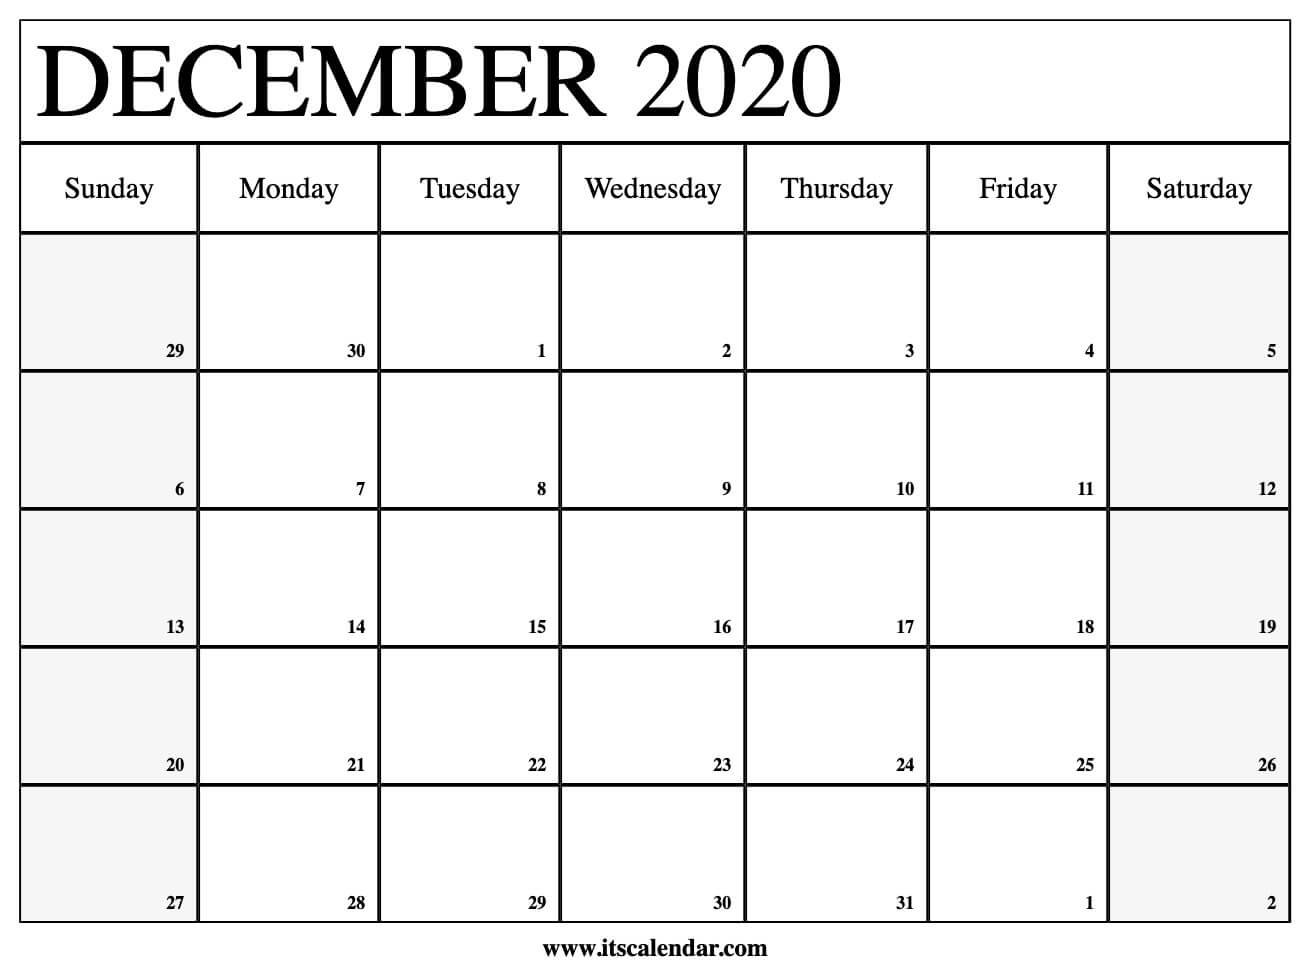 Printable December 2020 Calendar.Free Printable December 2020 Calendar